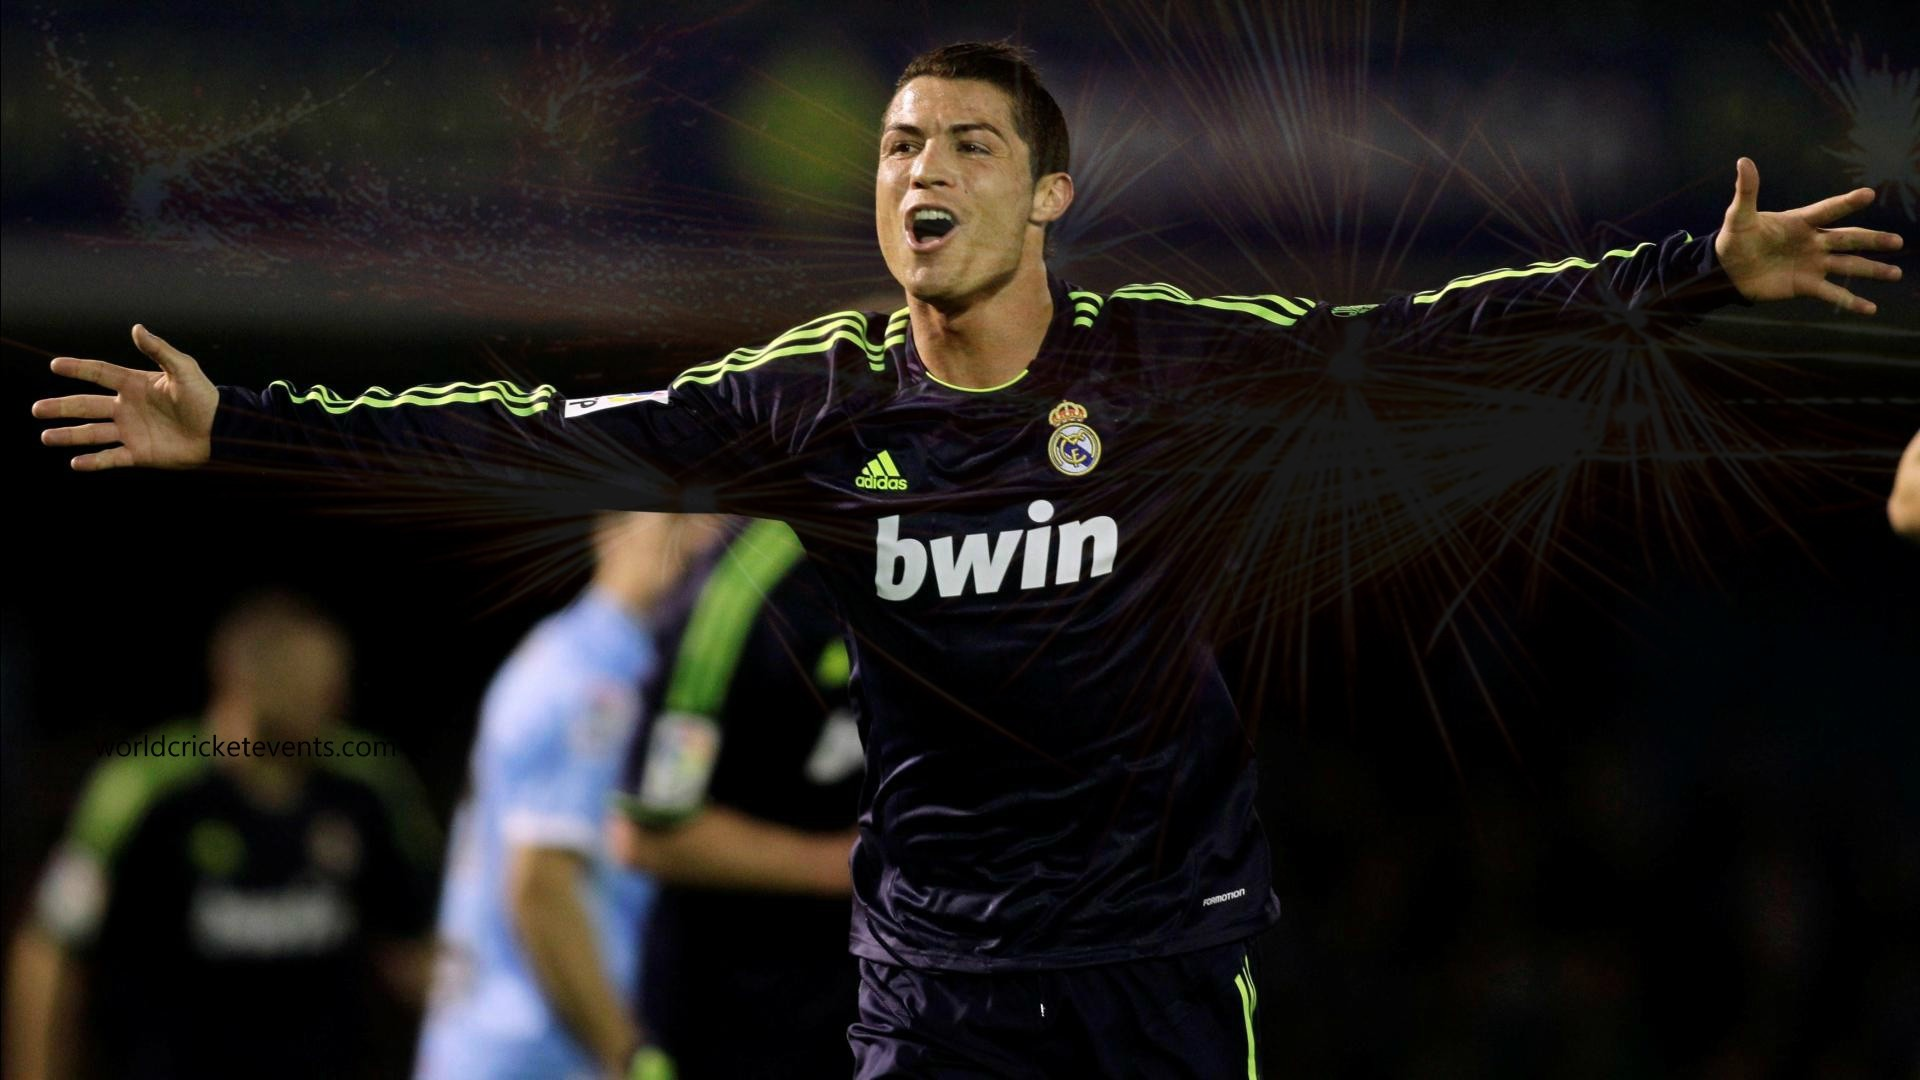 Cristiano Ronaldo Best 30 hd desktop wallpaper  https://worldcricketevents.com/cristiano